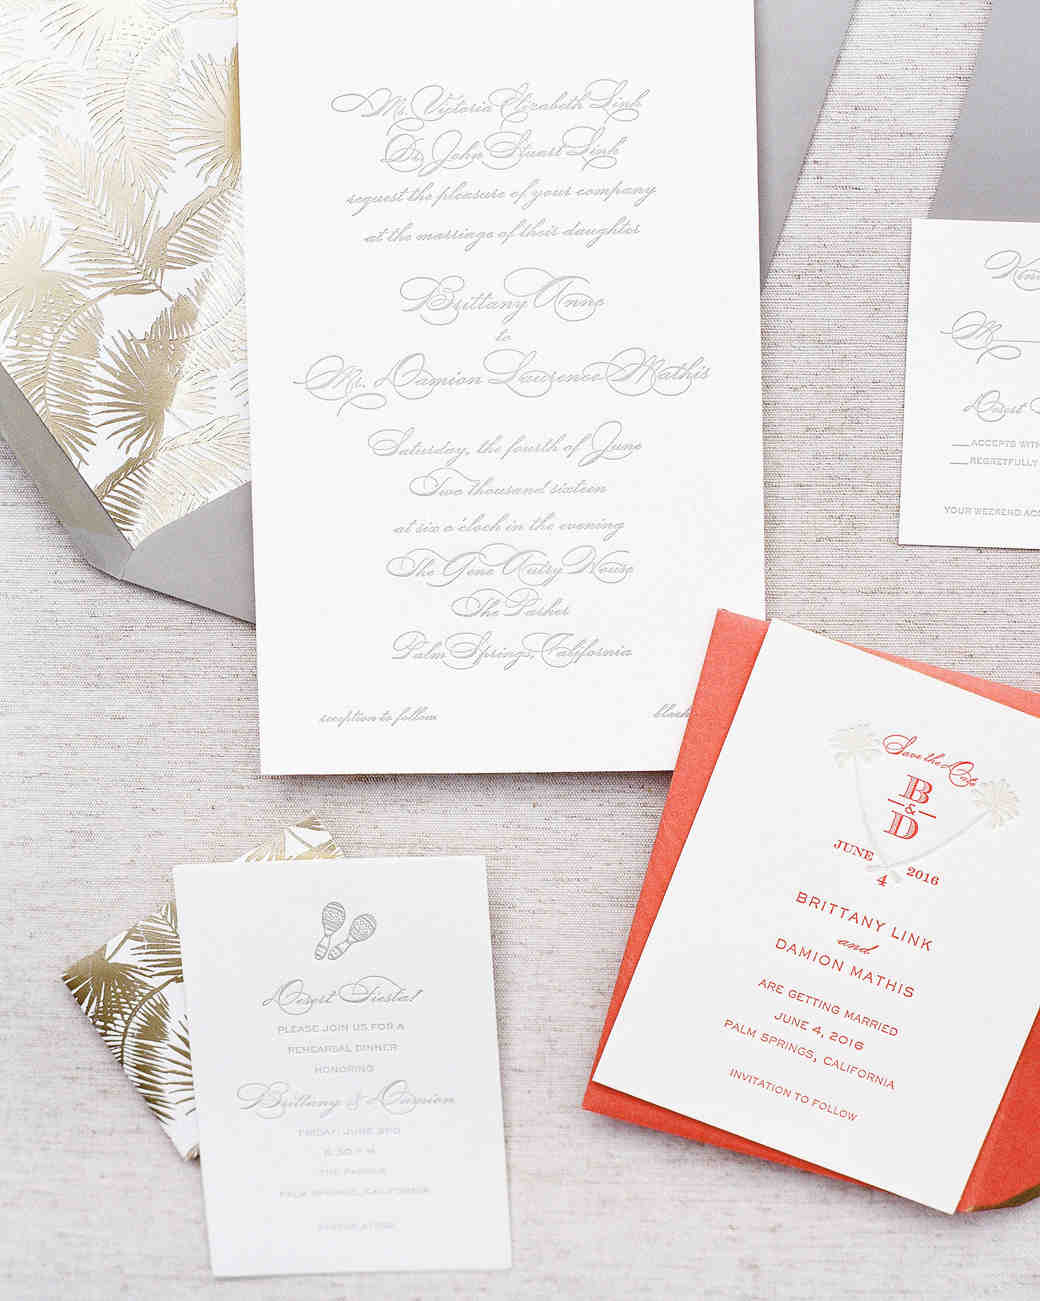 Royal wedding invitation dress code chelsea invitation for Royal wedding dress code